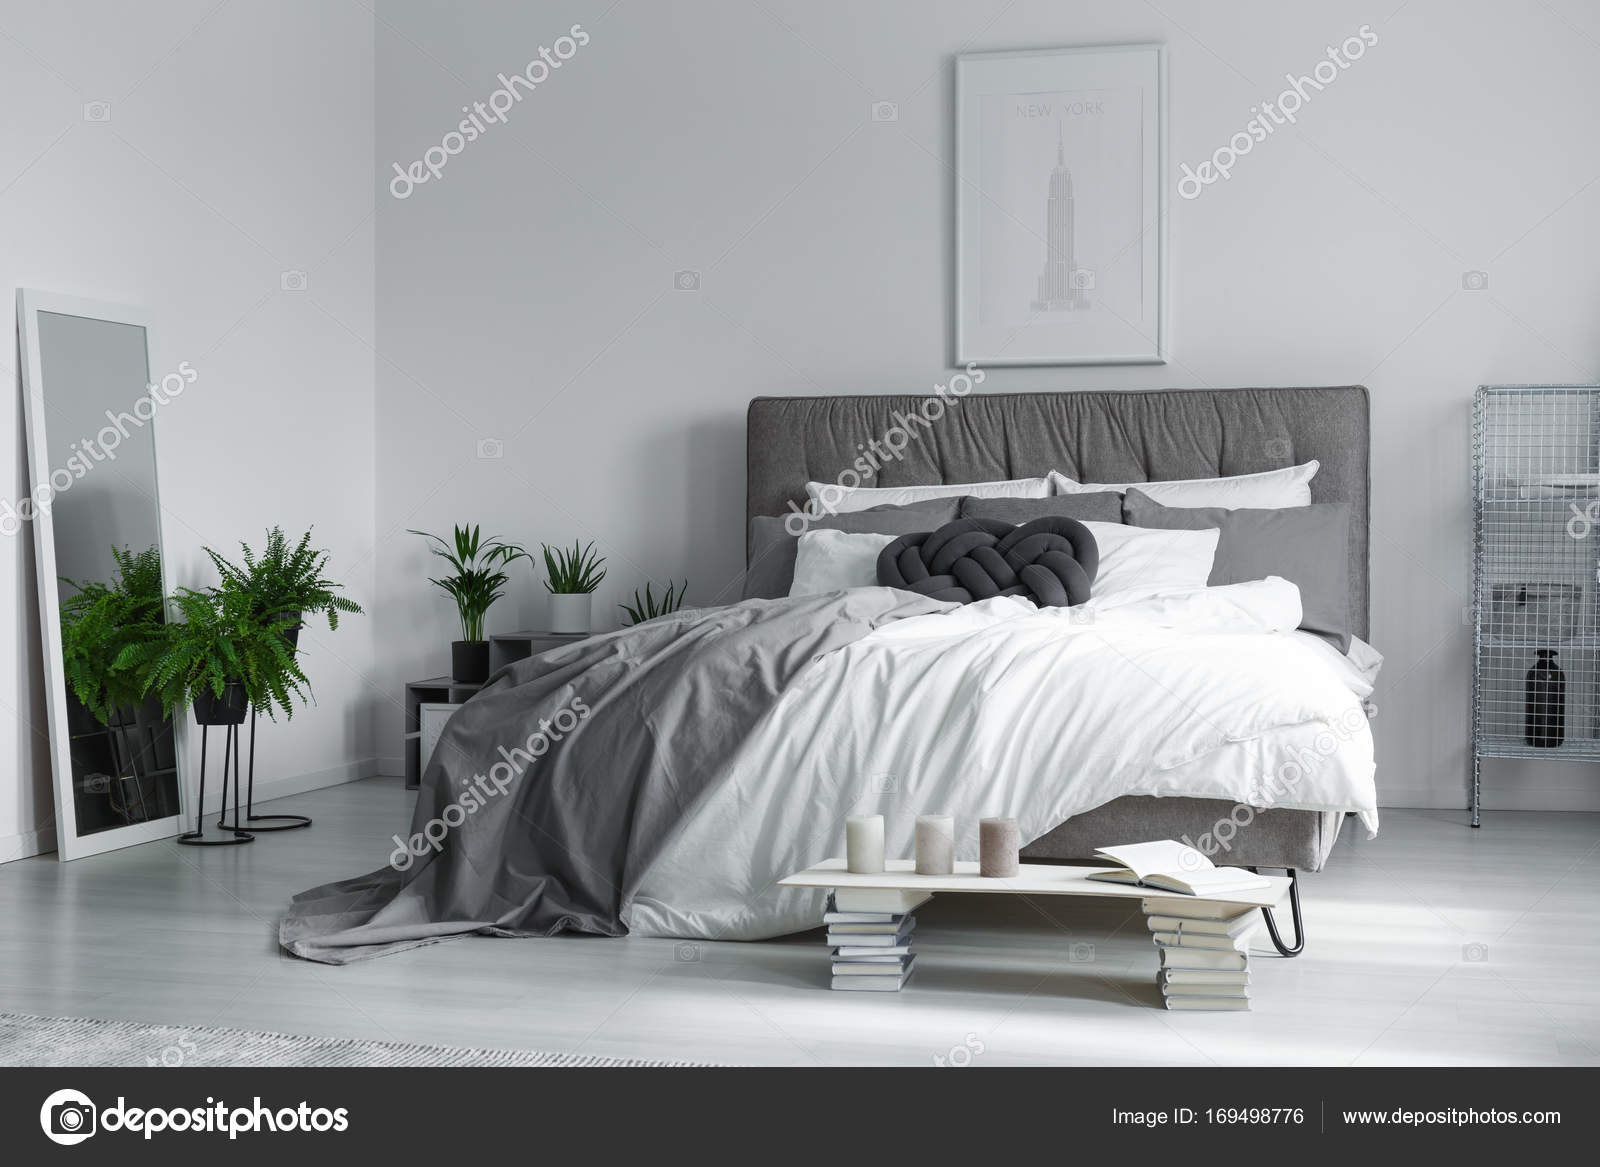 Elegant interieur van slaapkamer u stockfoto photographee eu